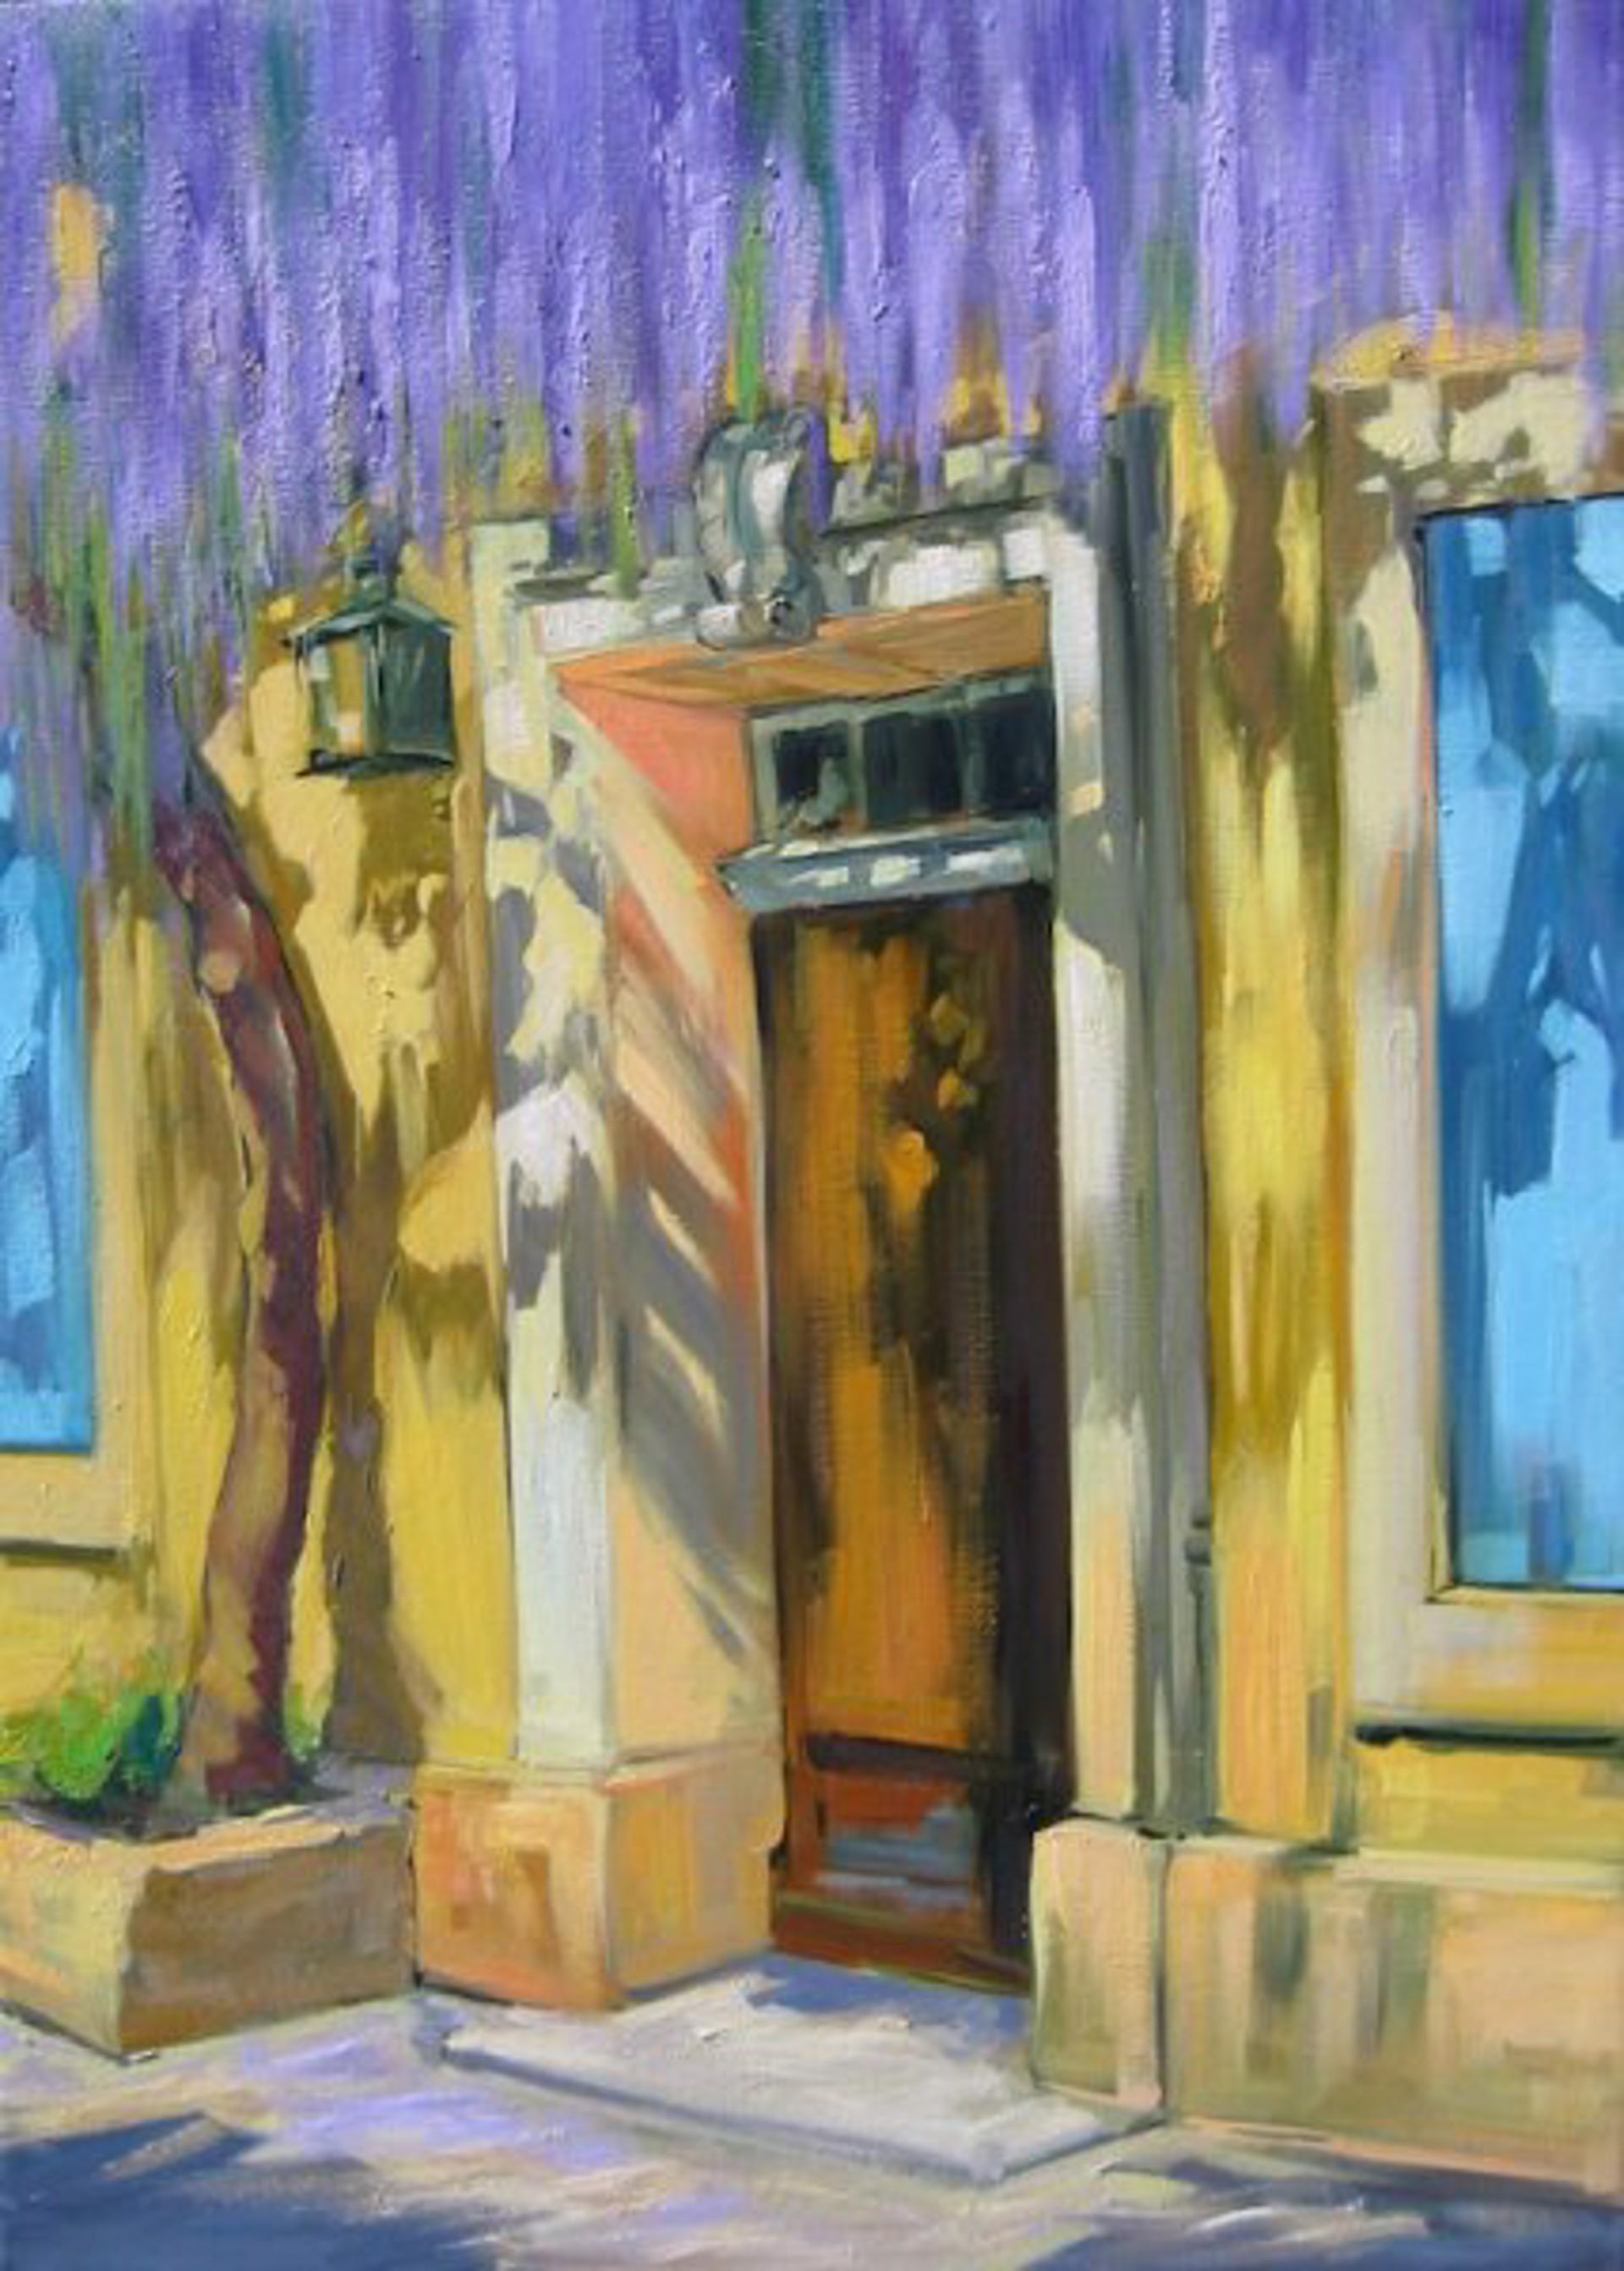 Bertran: Cascading Wisteria Over The Doorway by Maria Bertrán